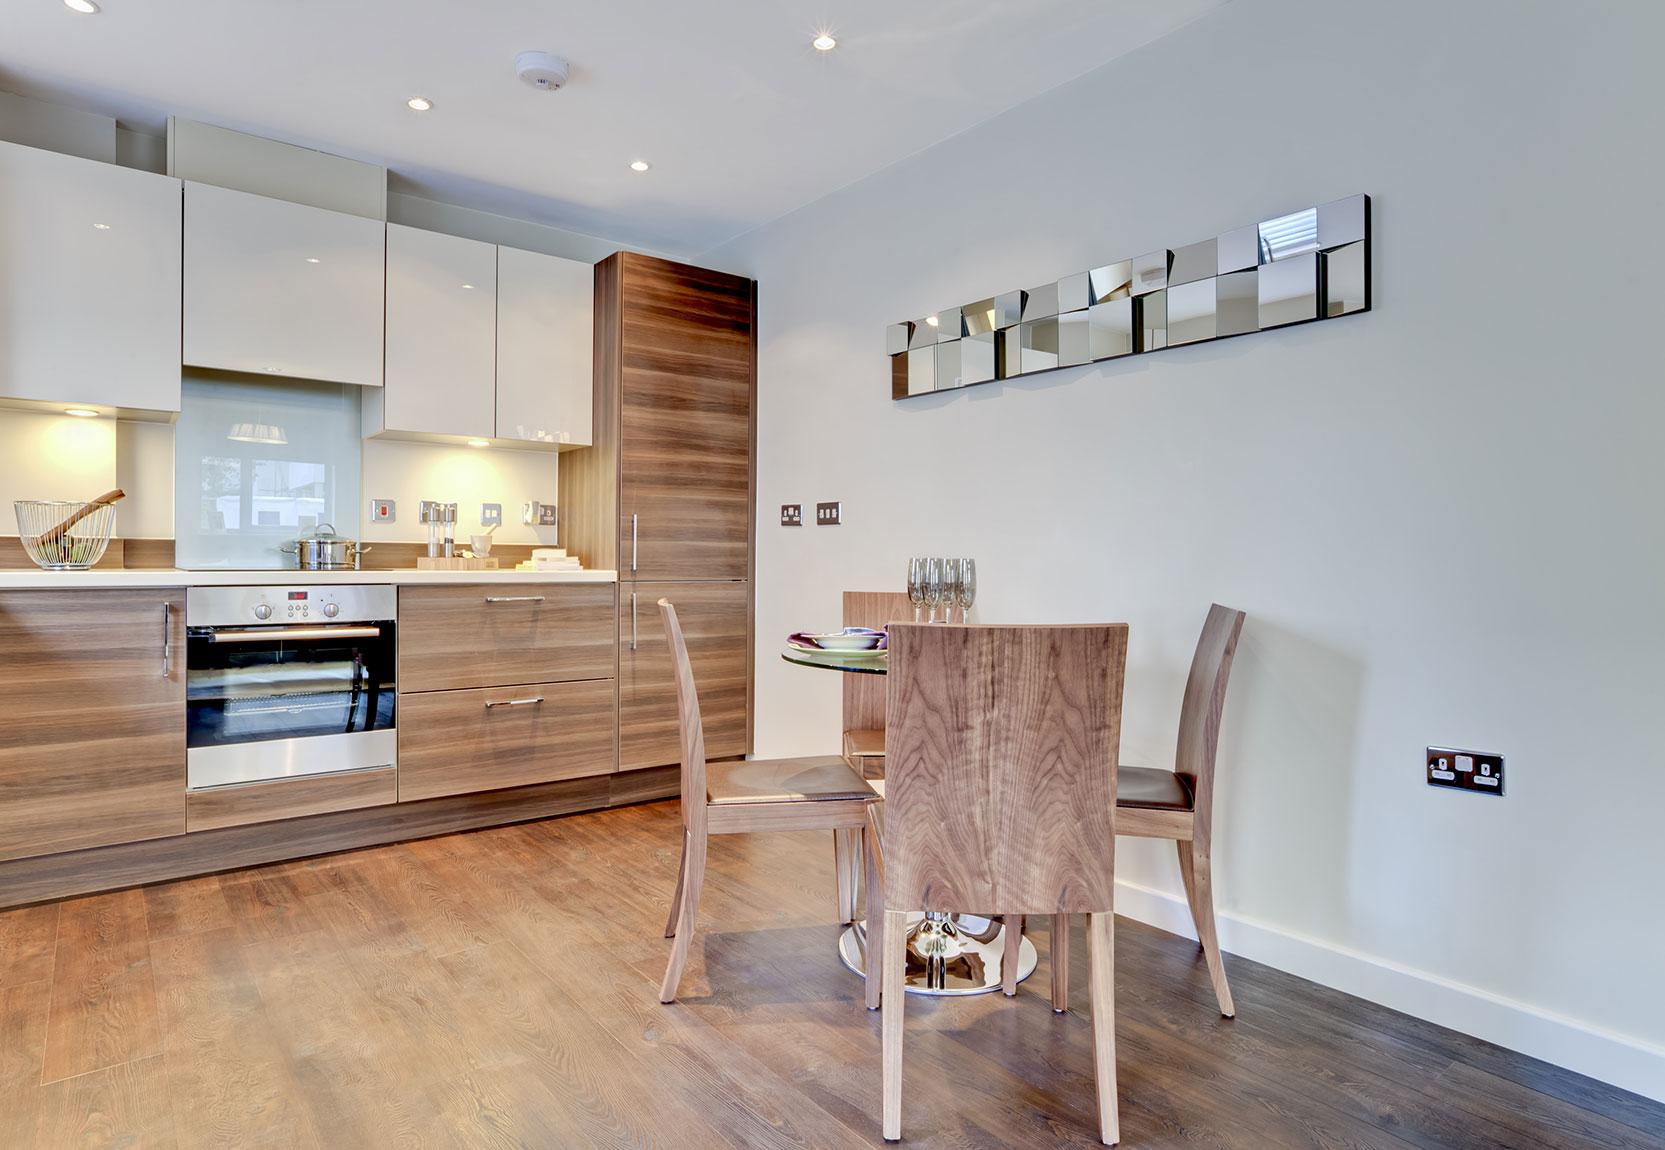 Small Modular Kitchen Design Ideas